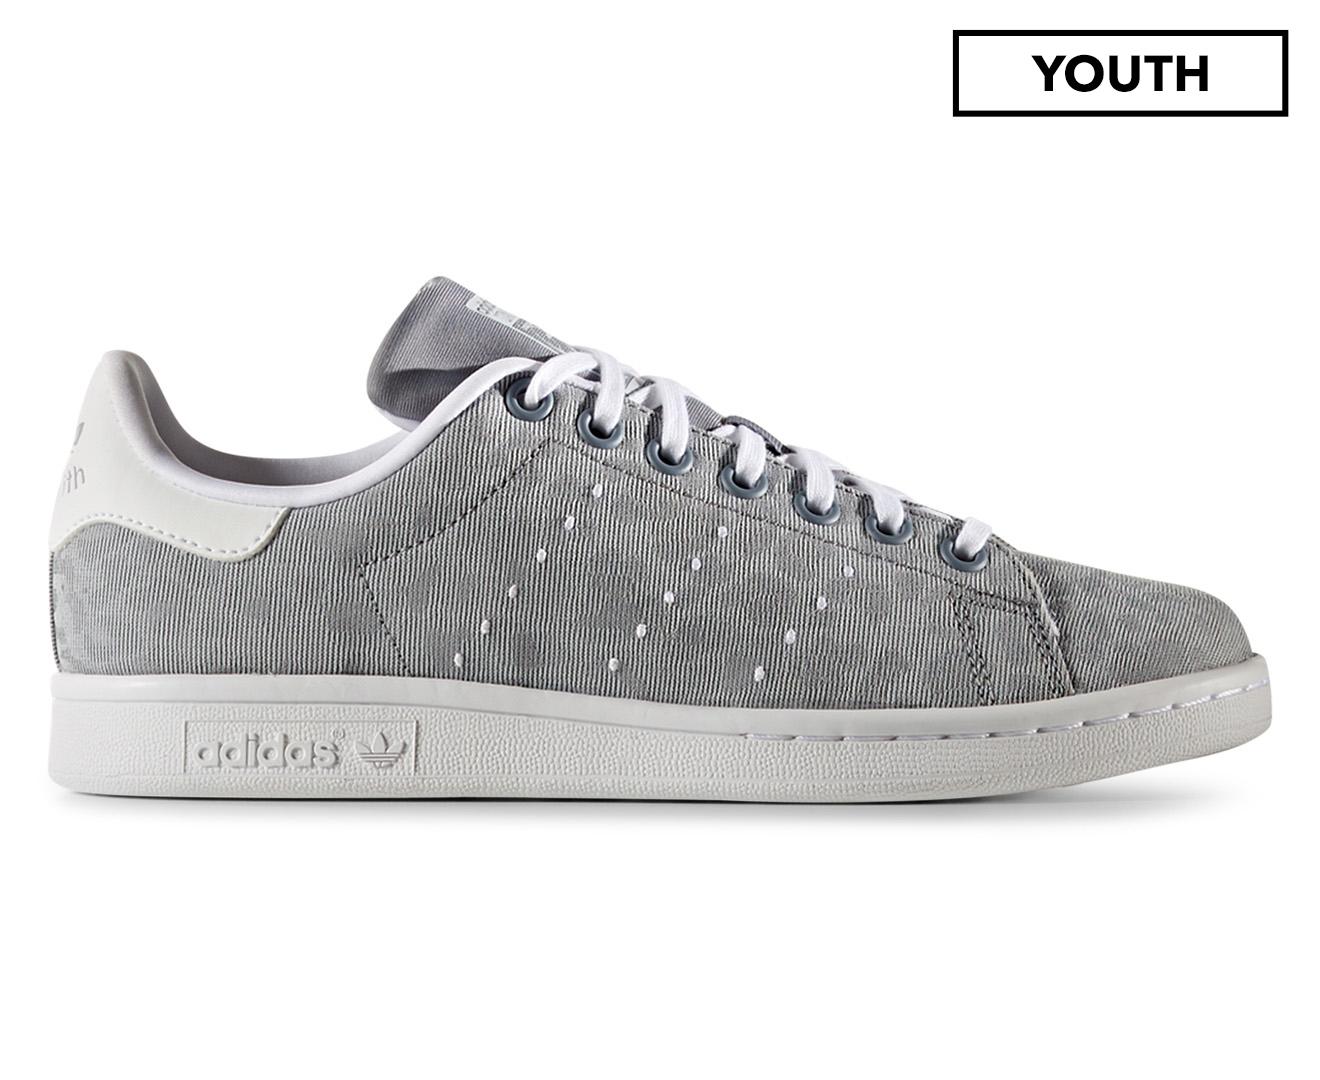 Adidas Originals Kids' Stan Smith Cheetah Swift Shoe - Grey/Grey/White